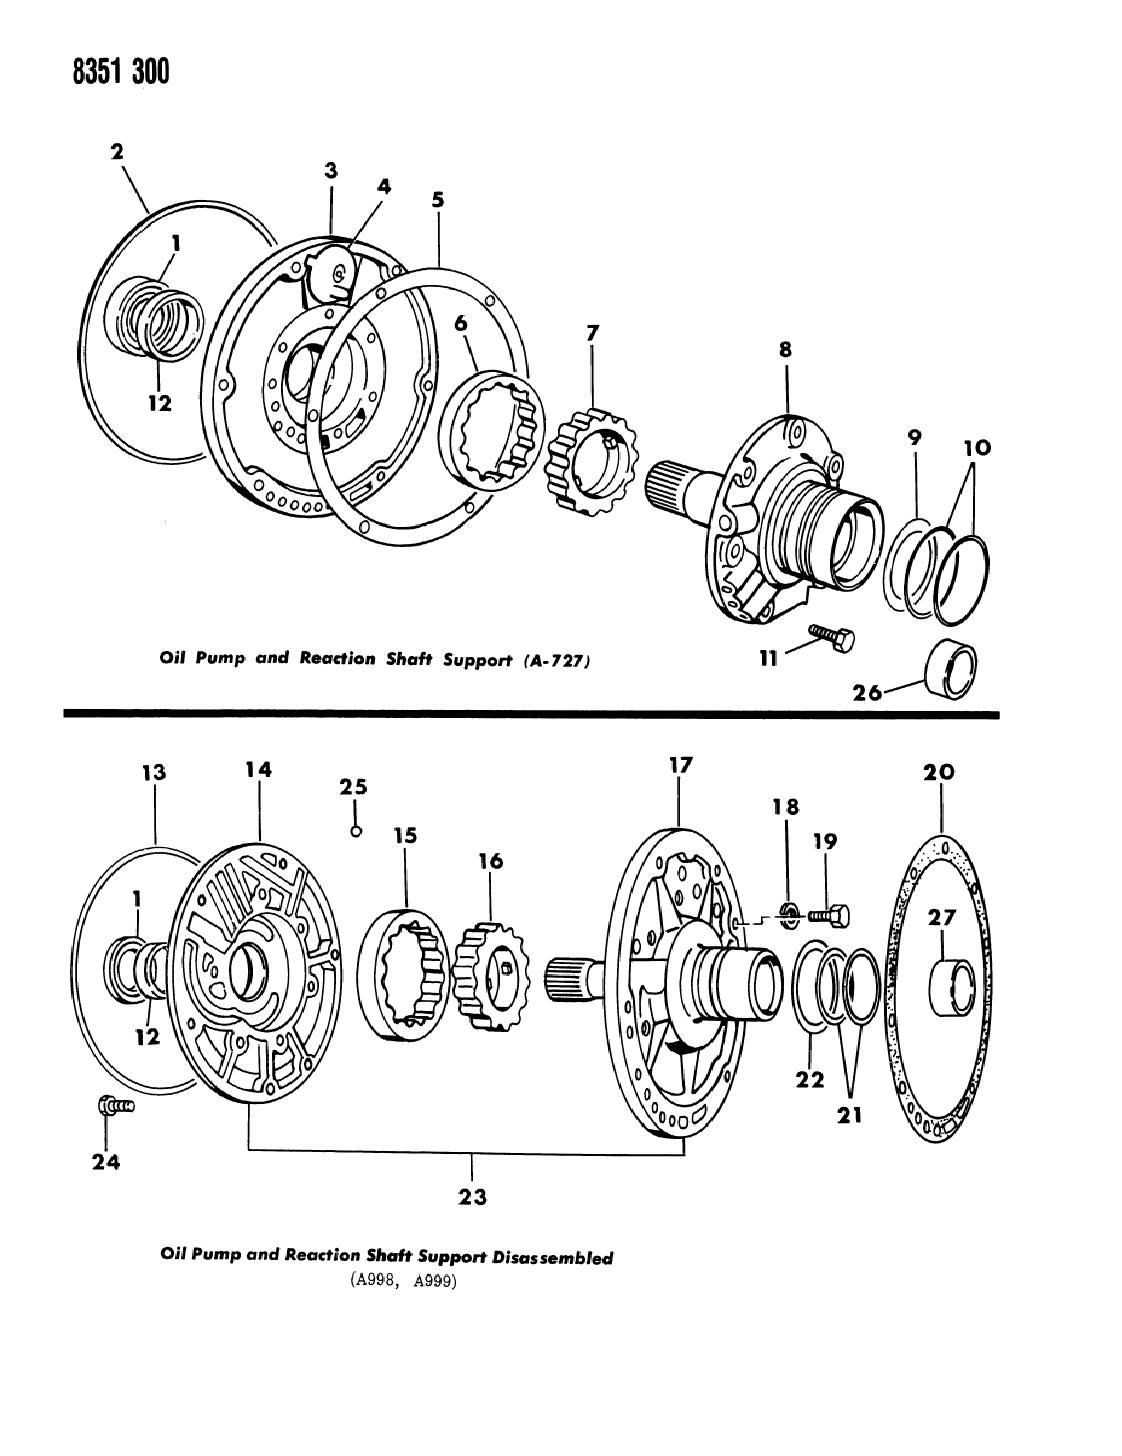 1989 Dodge Dakota Oil Pump With Reaction Shaft - Thumbnail 1